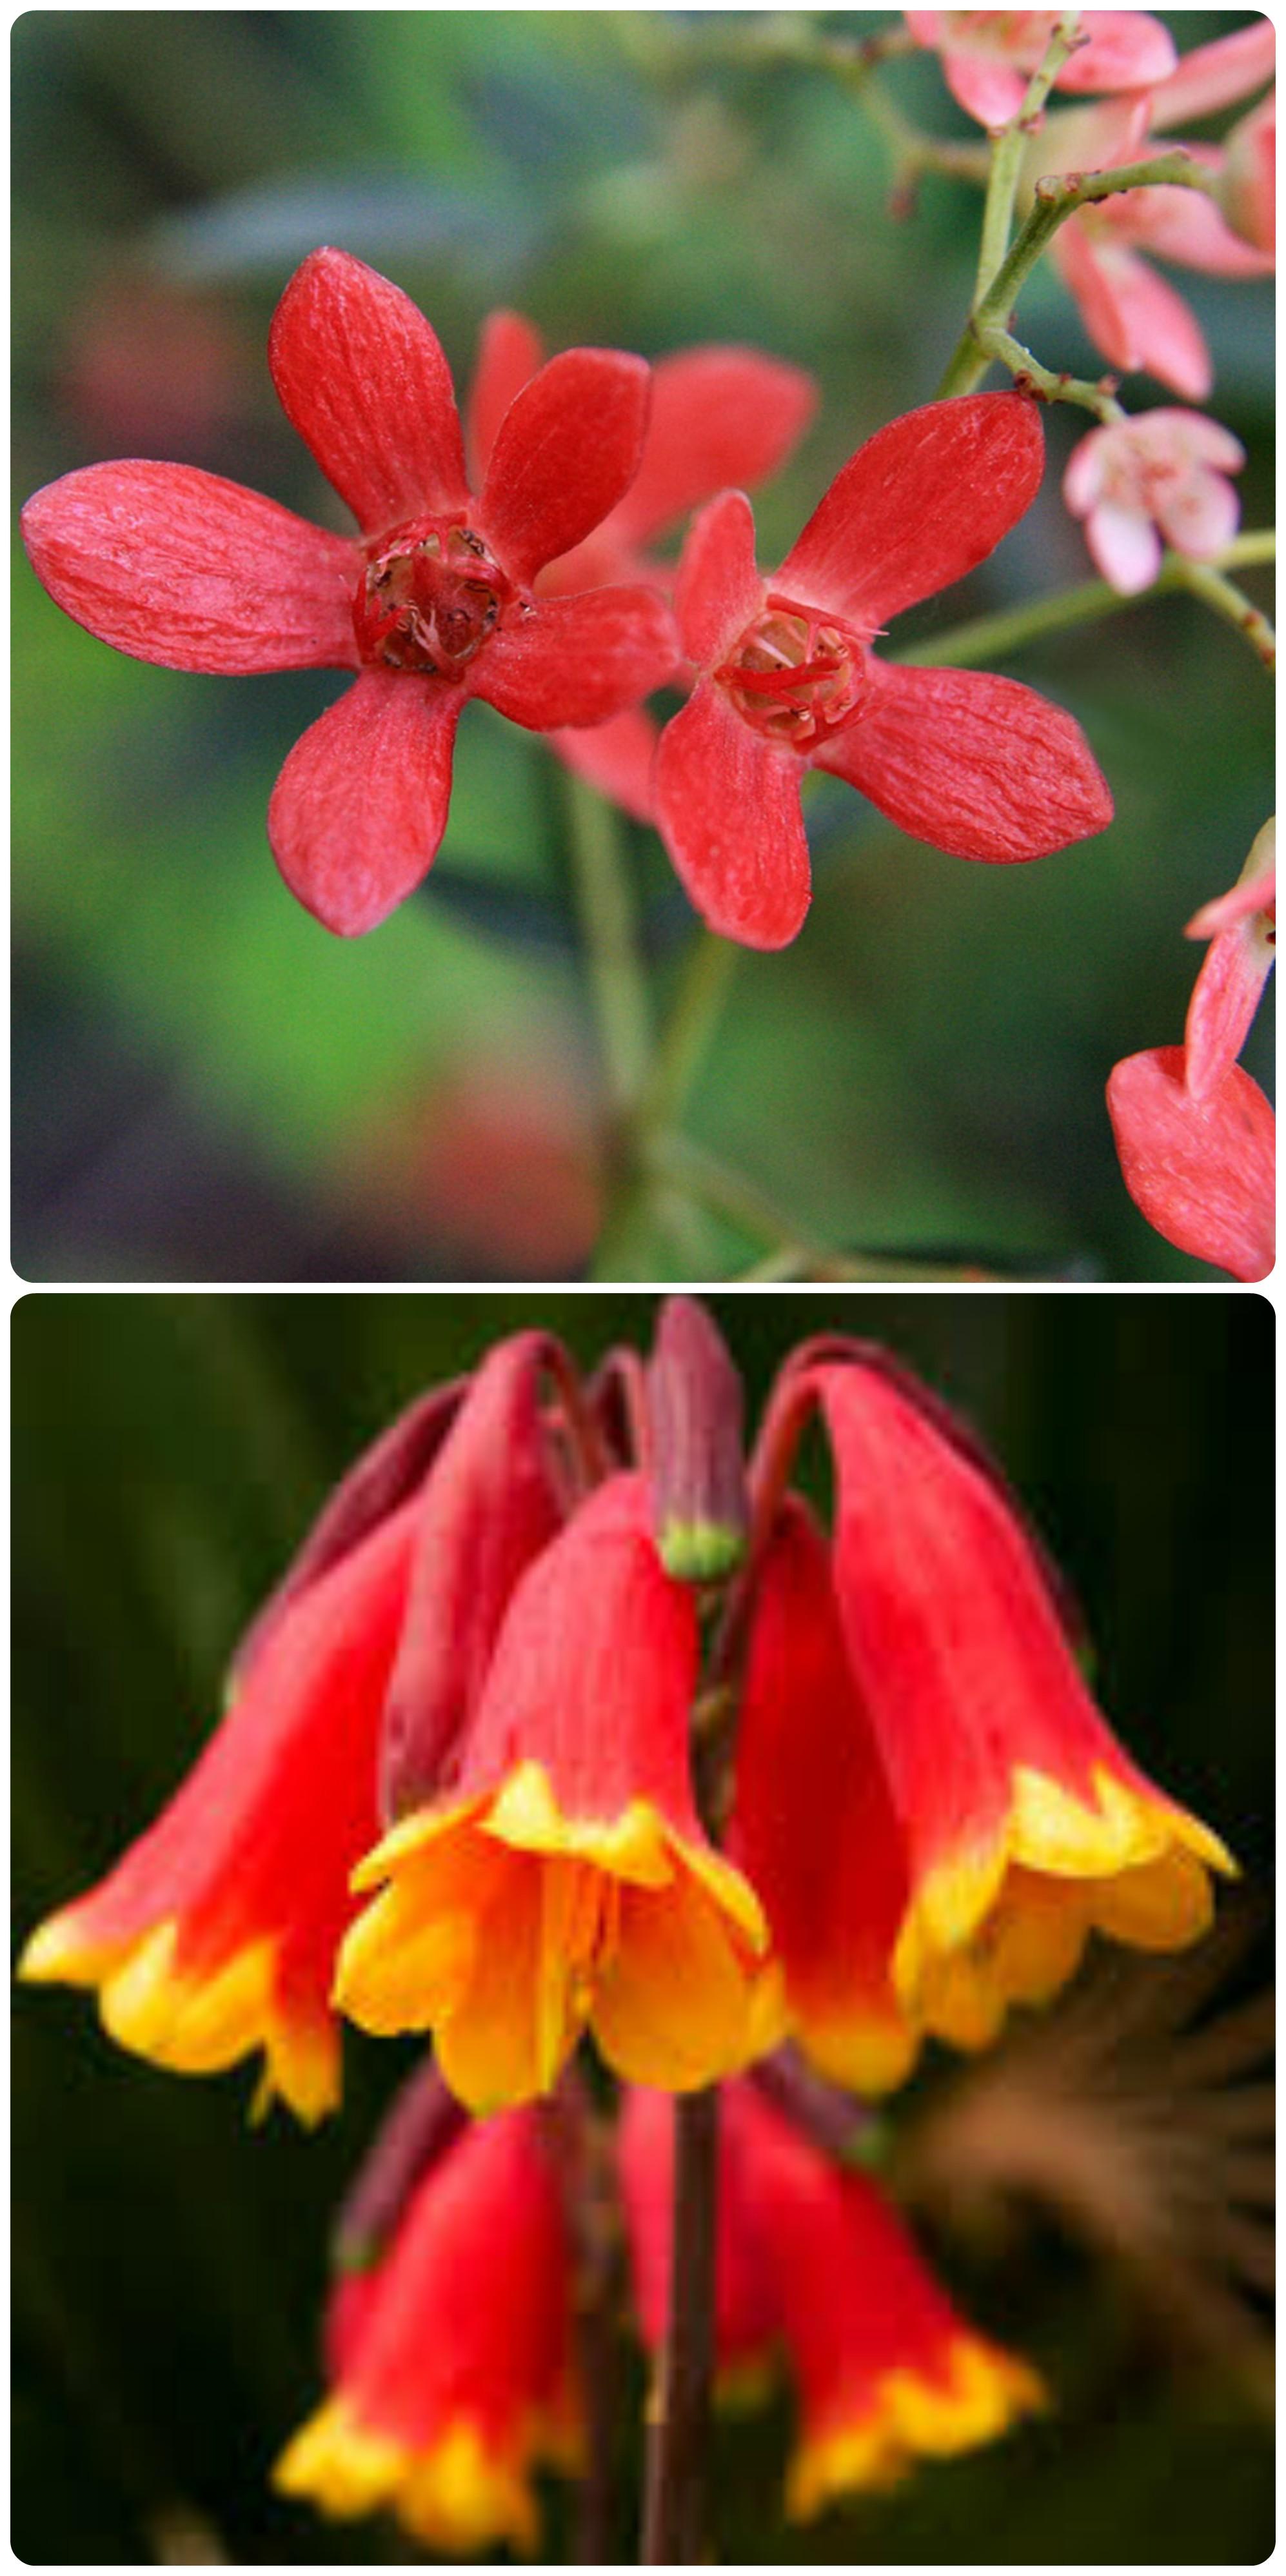 australianflowers